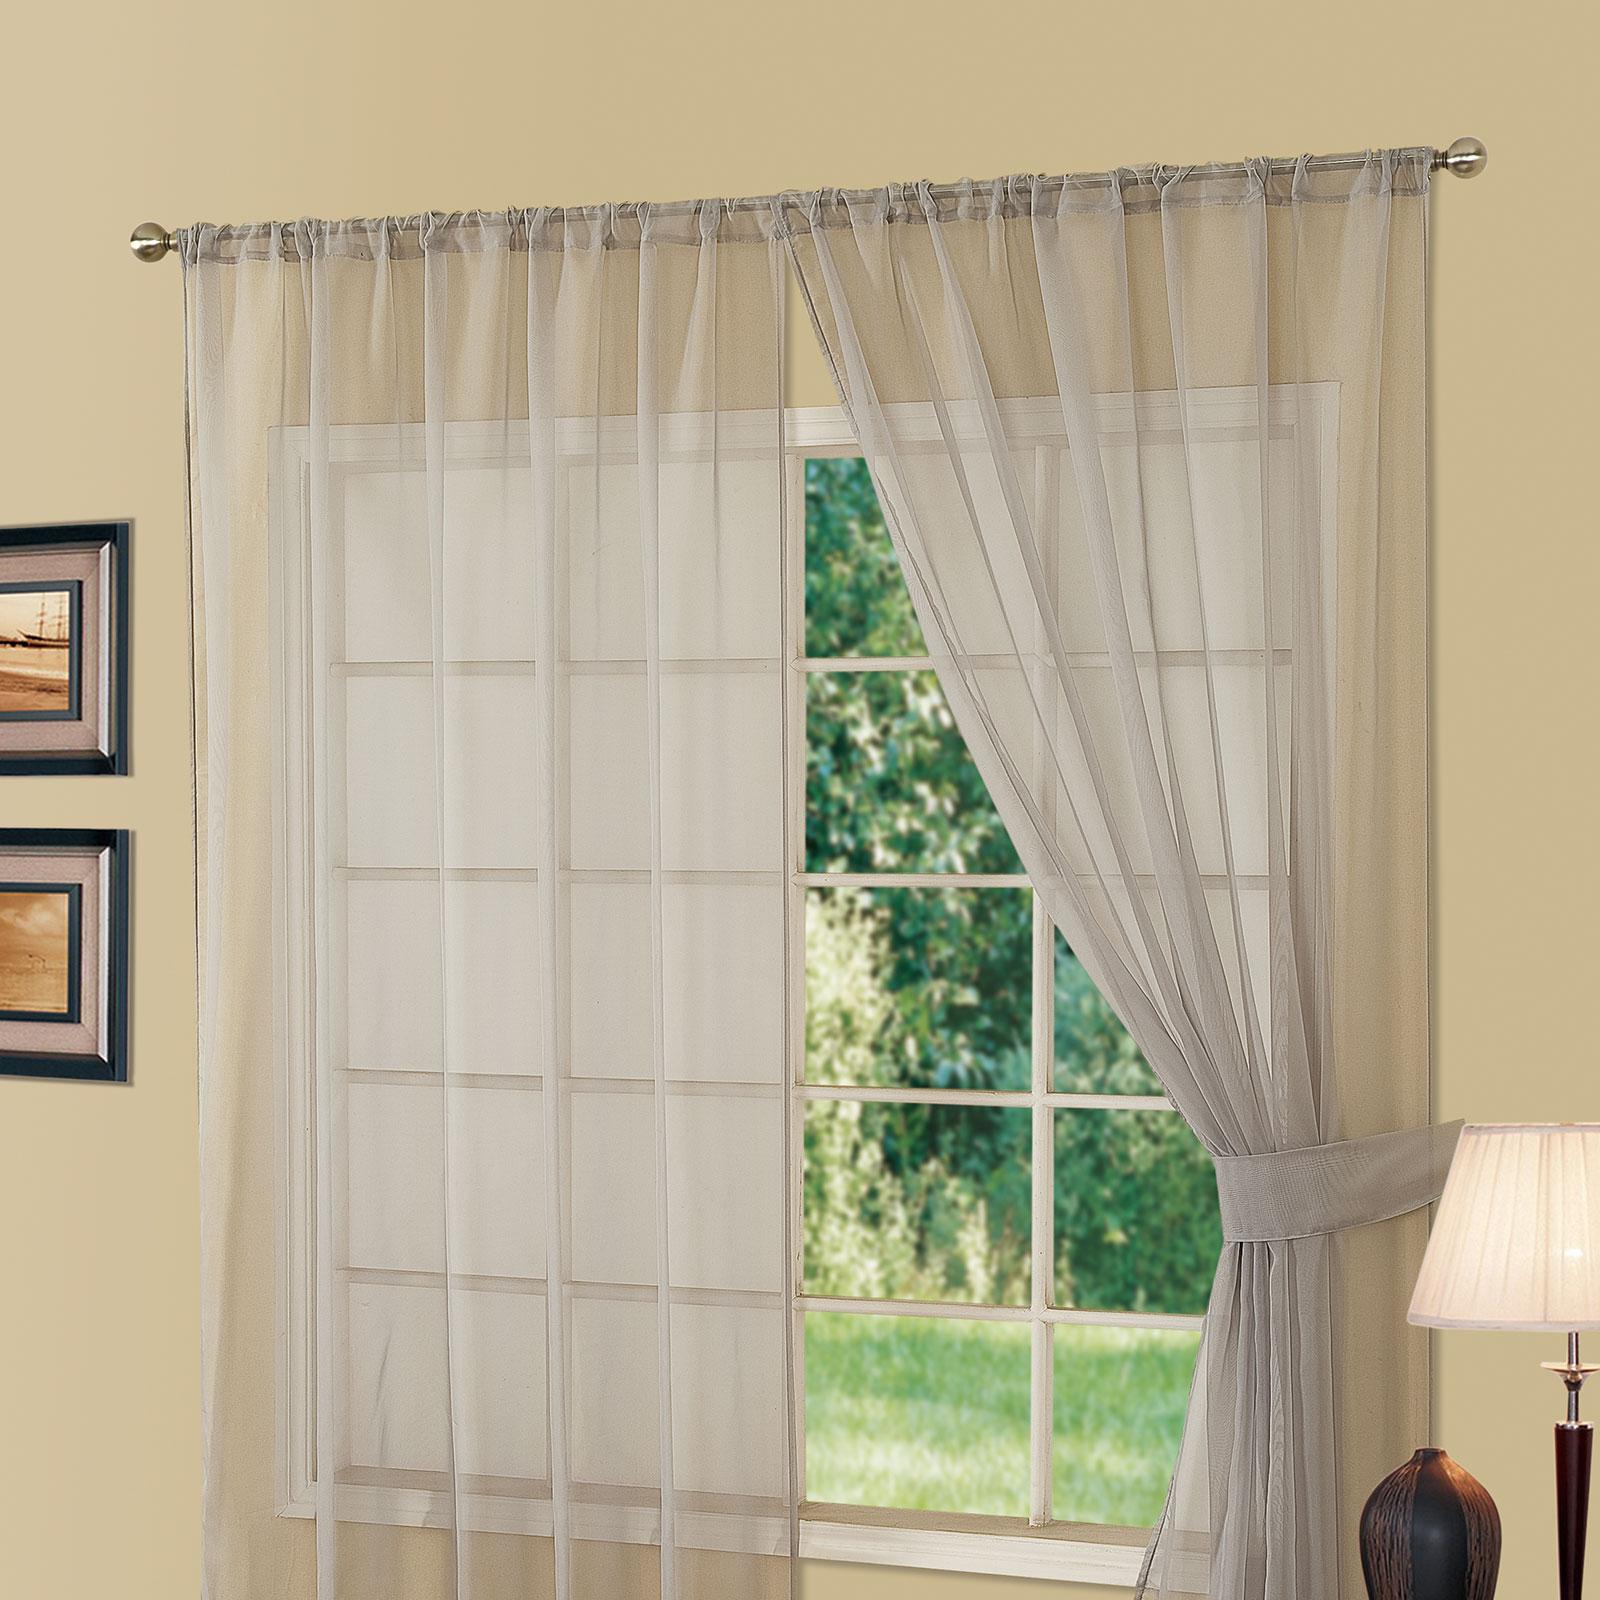 llano de dreamscene ranura gasa superior red ventana cortina panel blanco